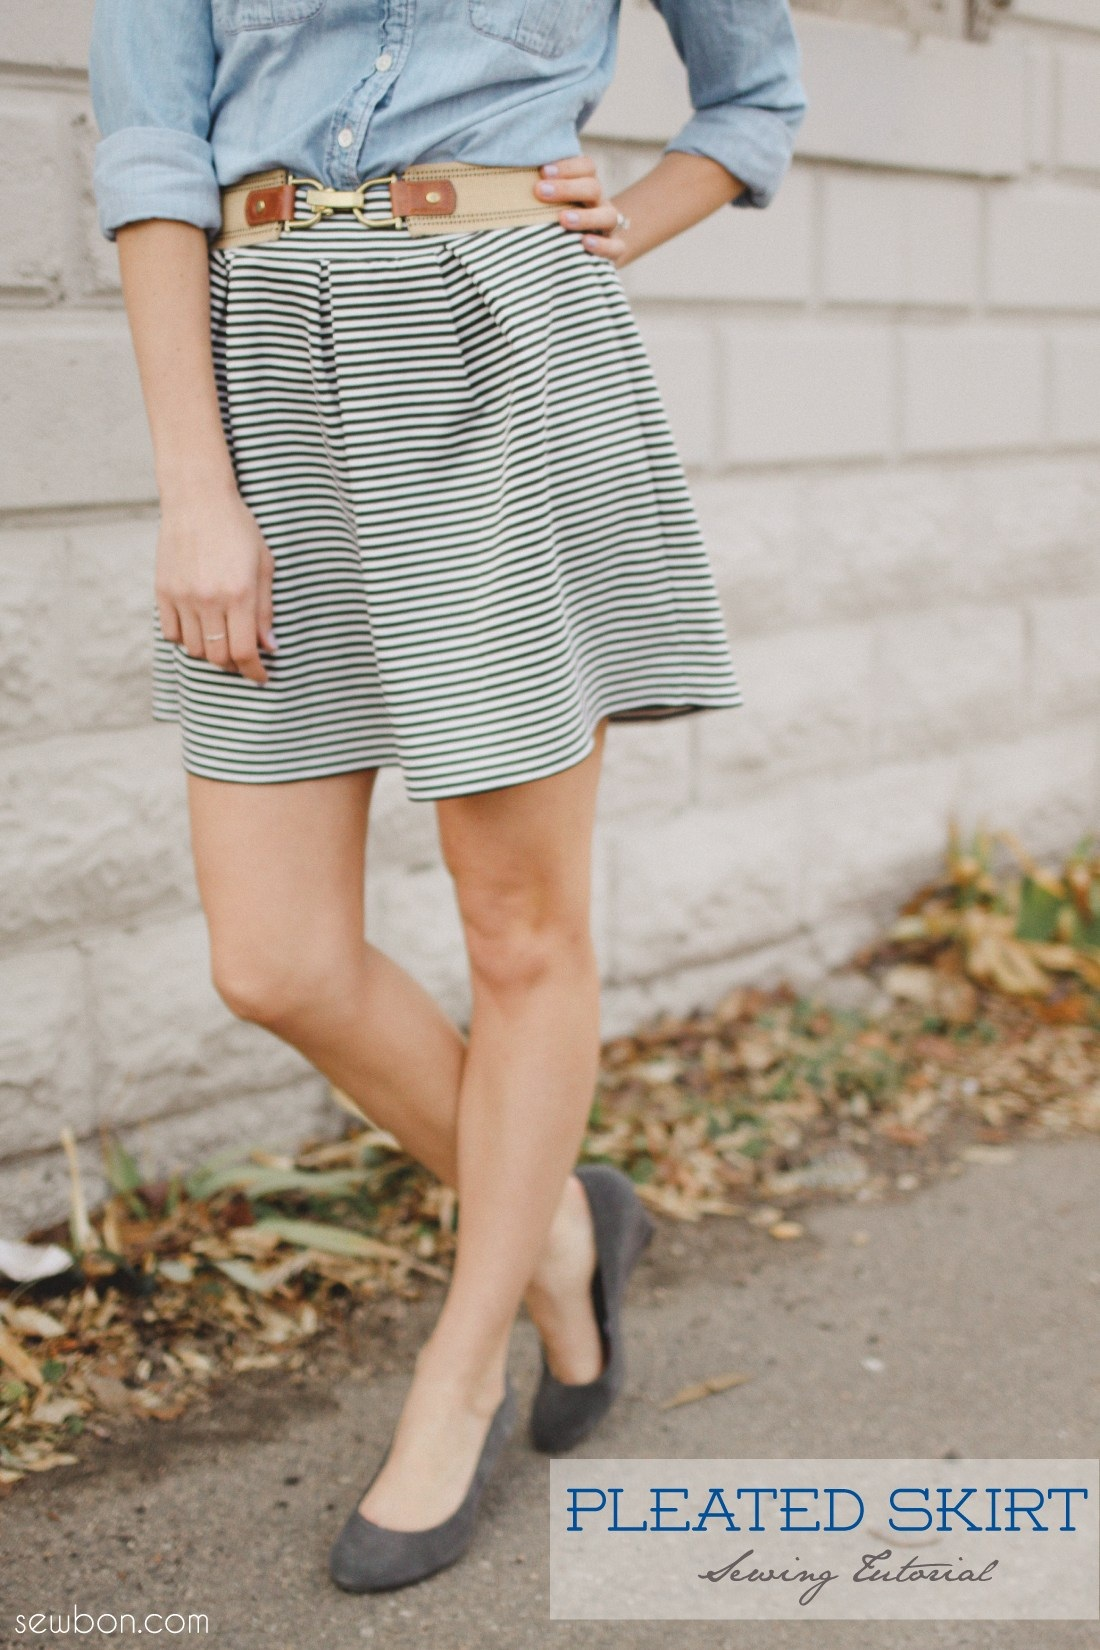 Knitting Skirt Tutorial : Tutorial pleated knit skirt craftsmile